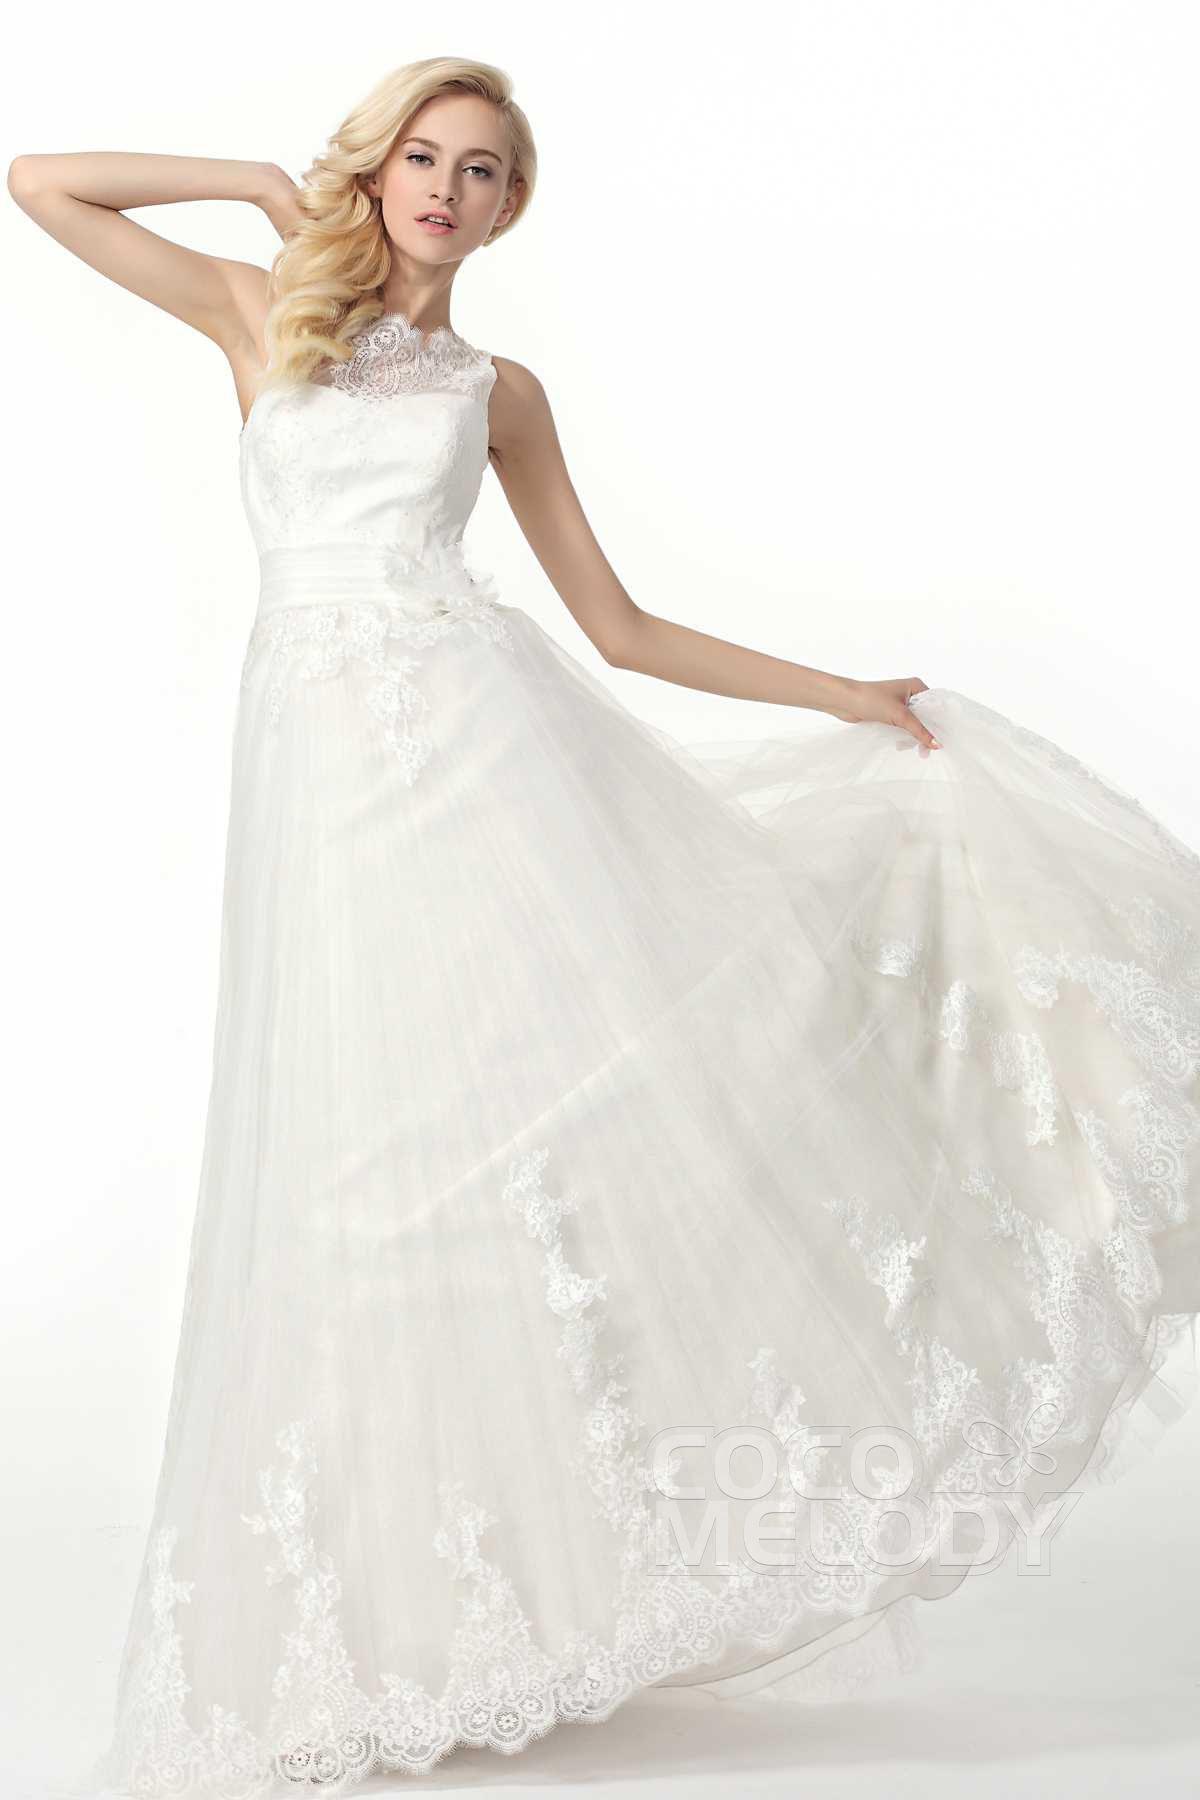 Classic+A-Line+Court+Train+Tulle+Wedding+Dress+Alb12322#cocomelody #weddingdress